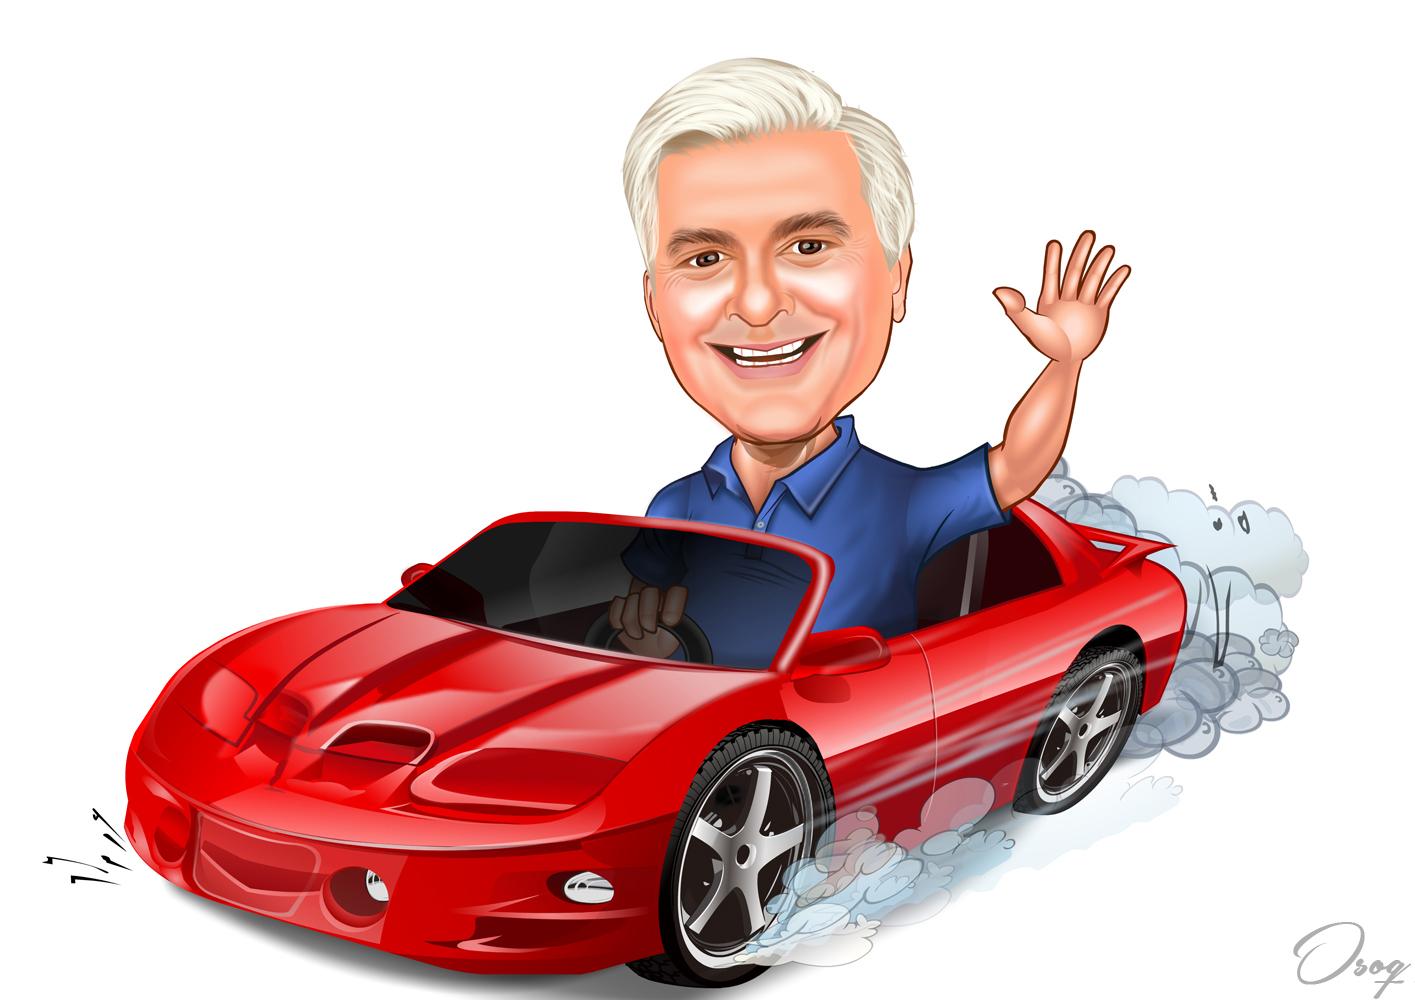 Car Caricature Osoq Com